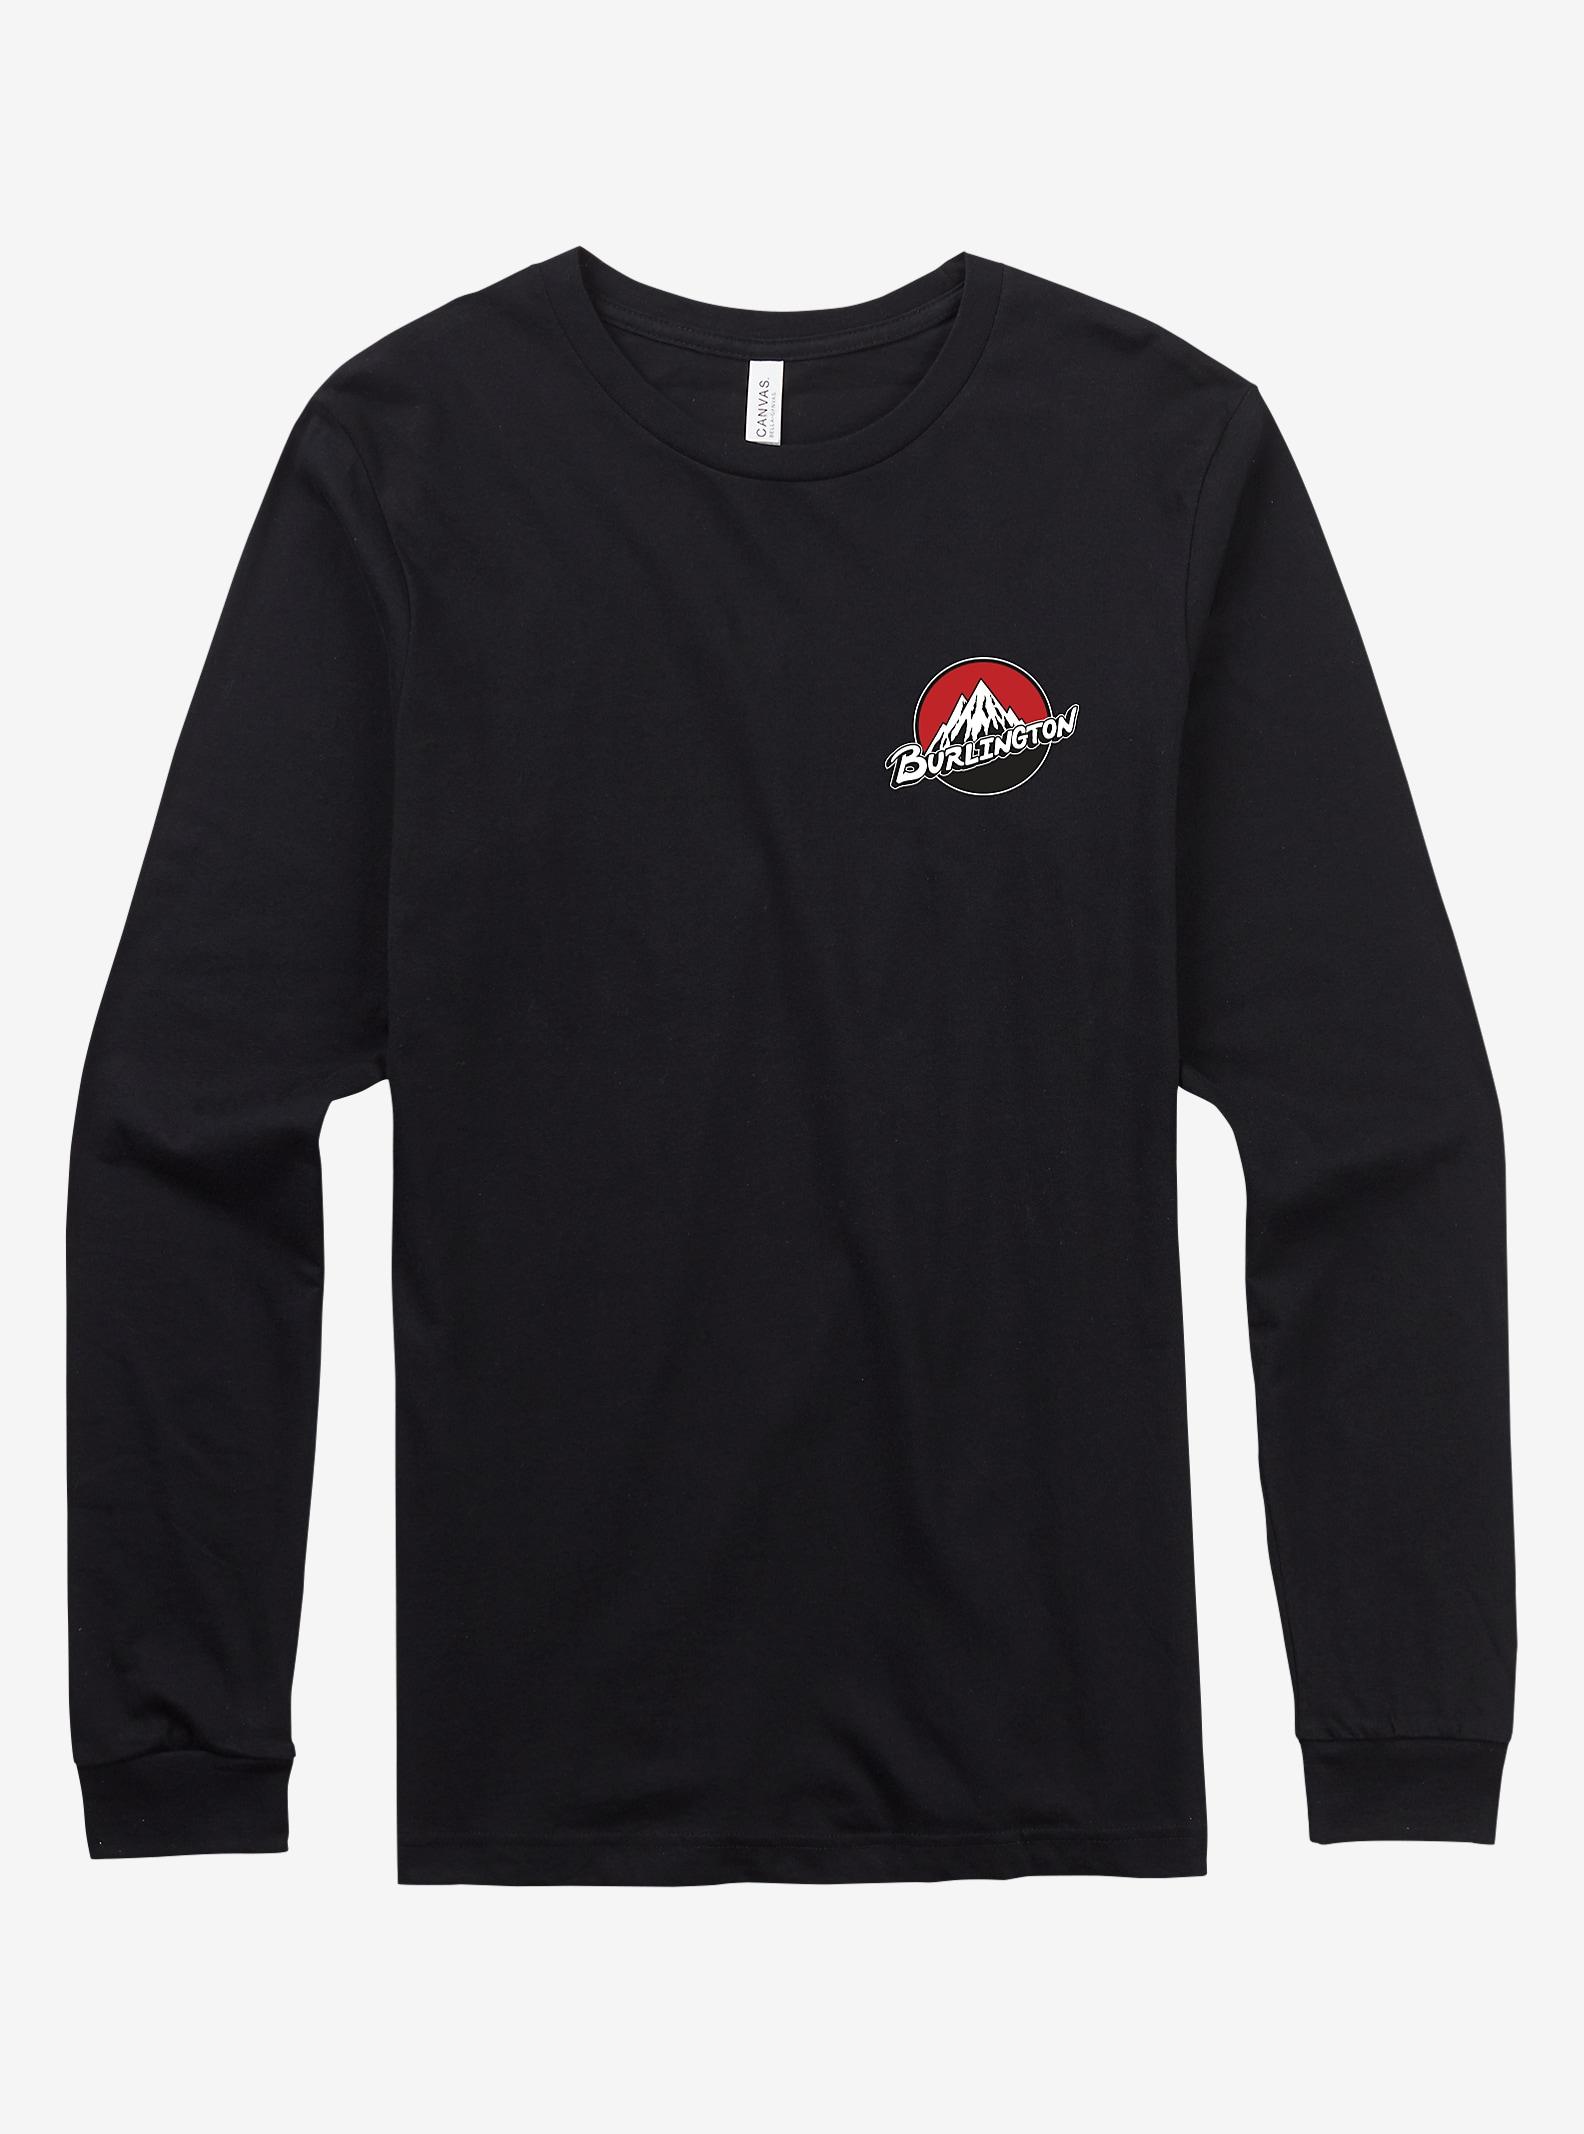 Burton City Retro Long Sleeve T Shirt shown in Burlington True Black